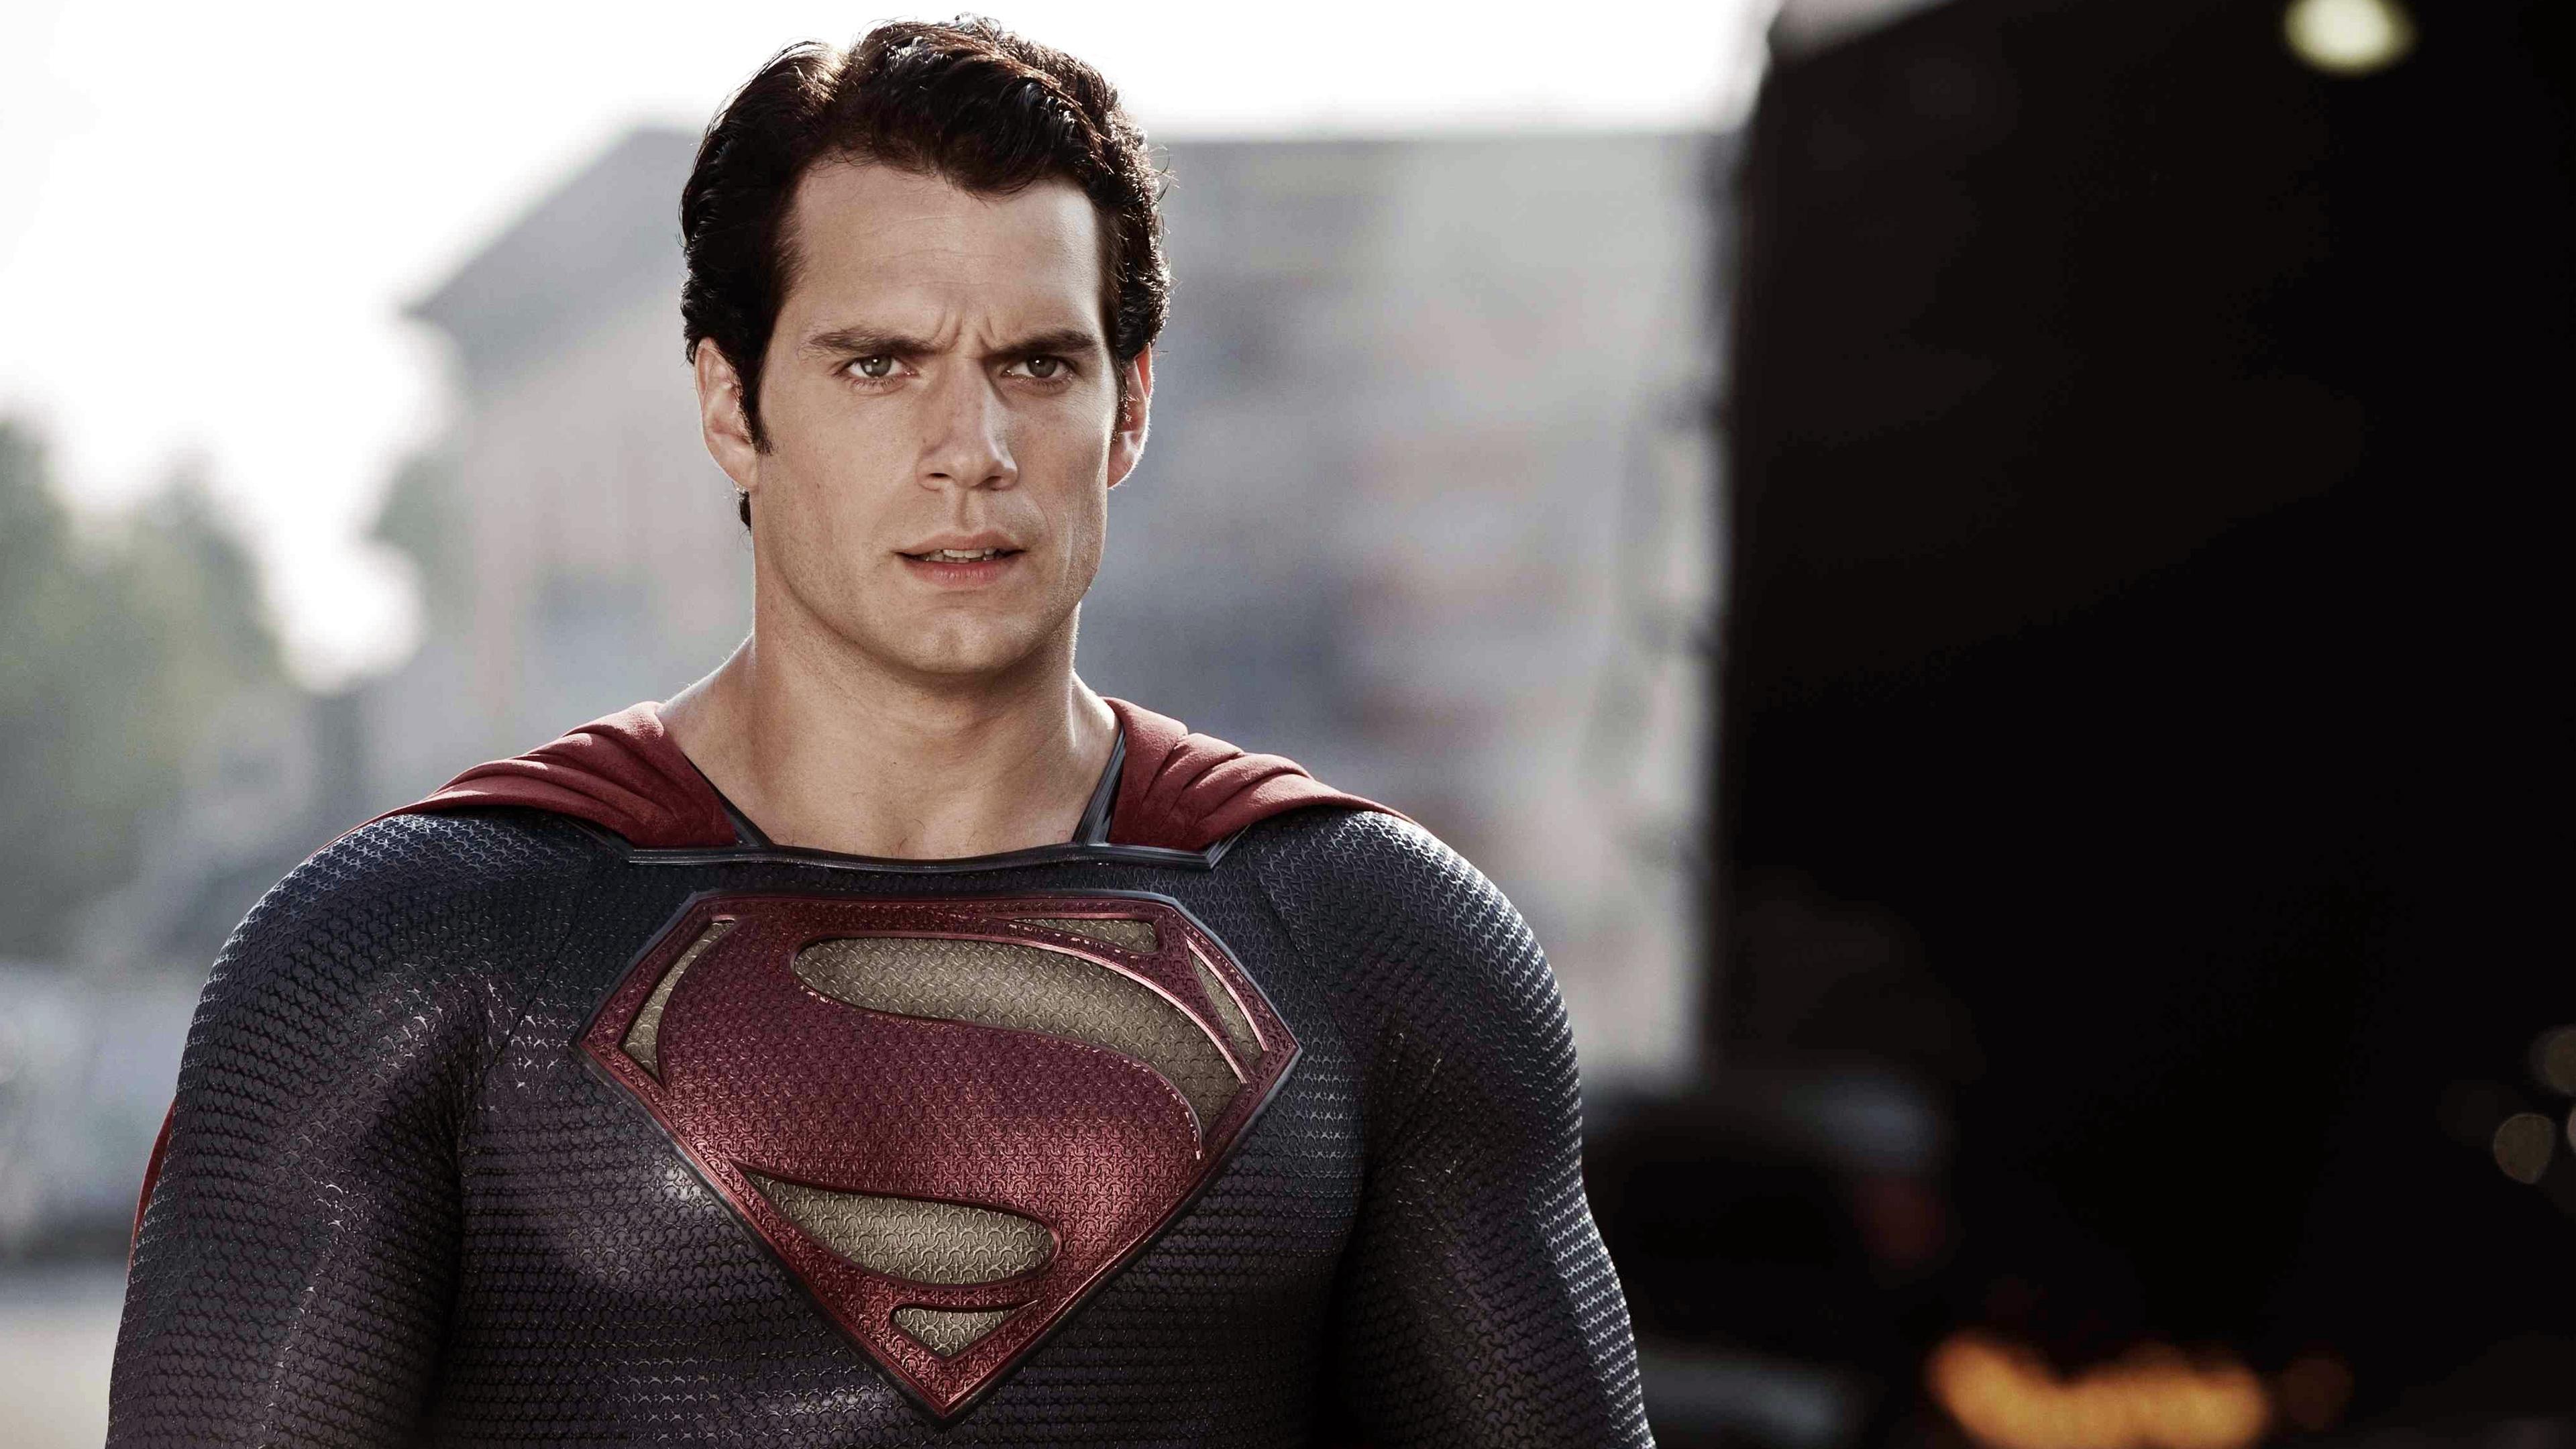 Superman Henry Cavill HD Wallpaper   iHD Wallpapers 3840x2160